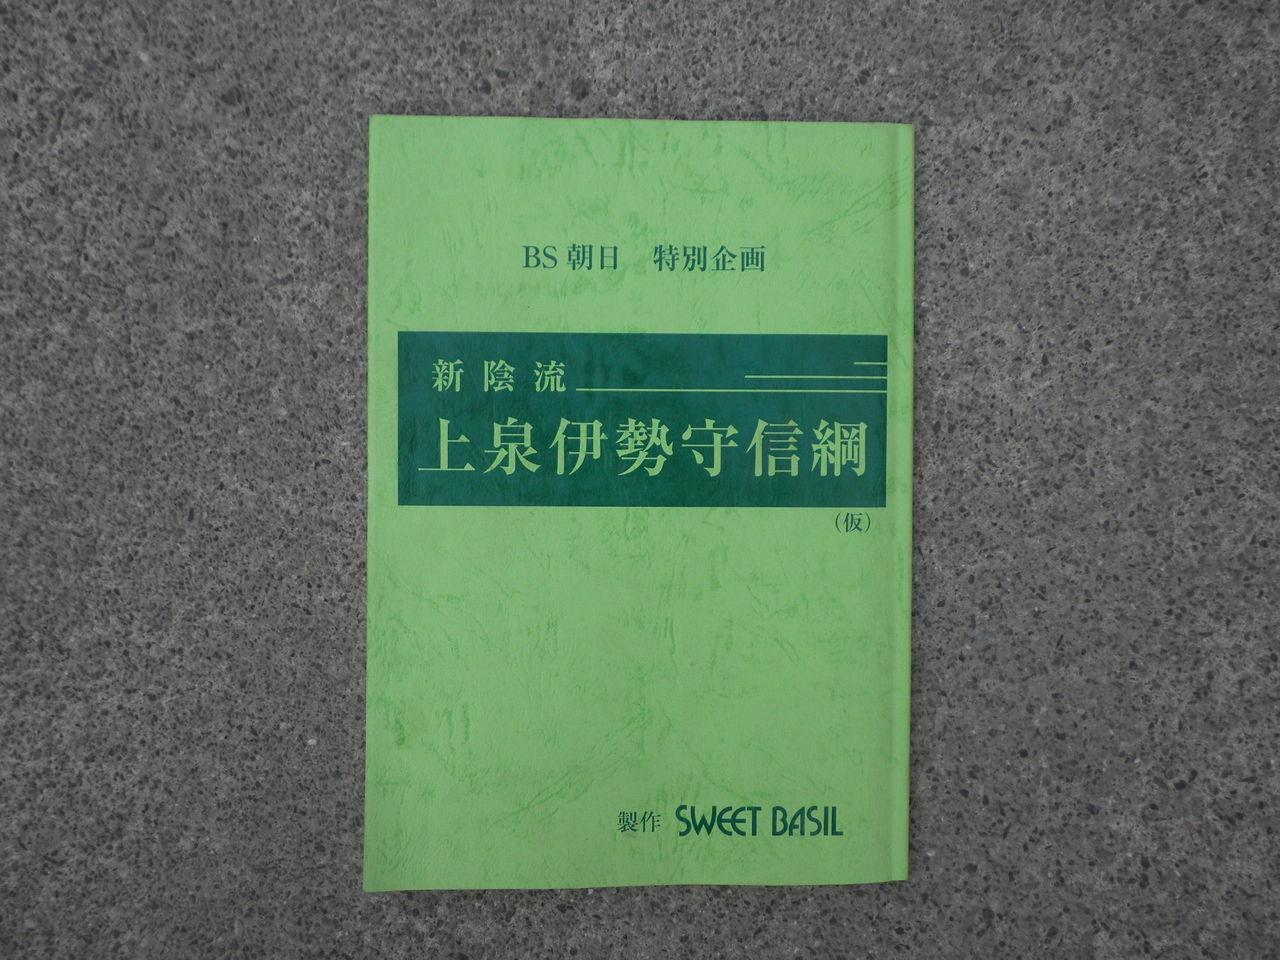 RIMG33232